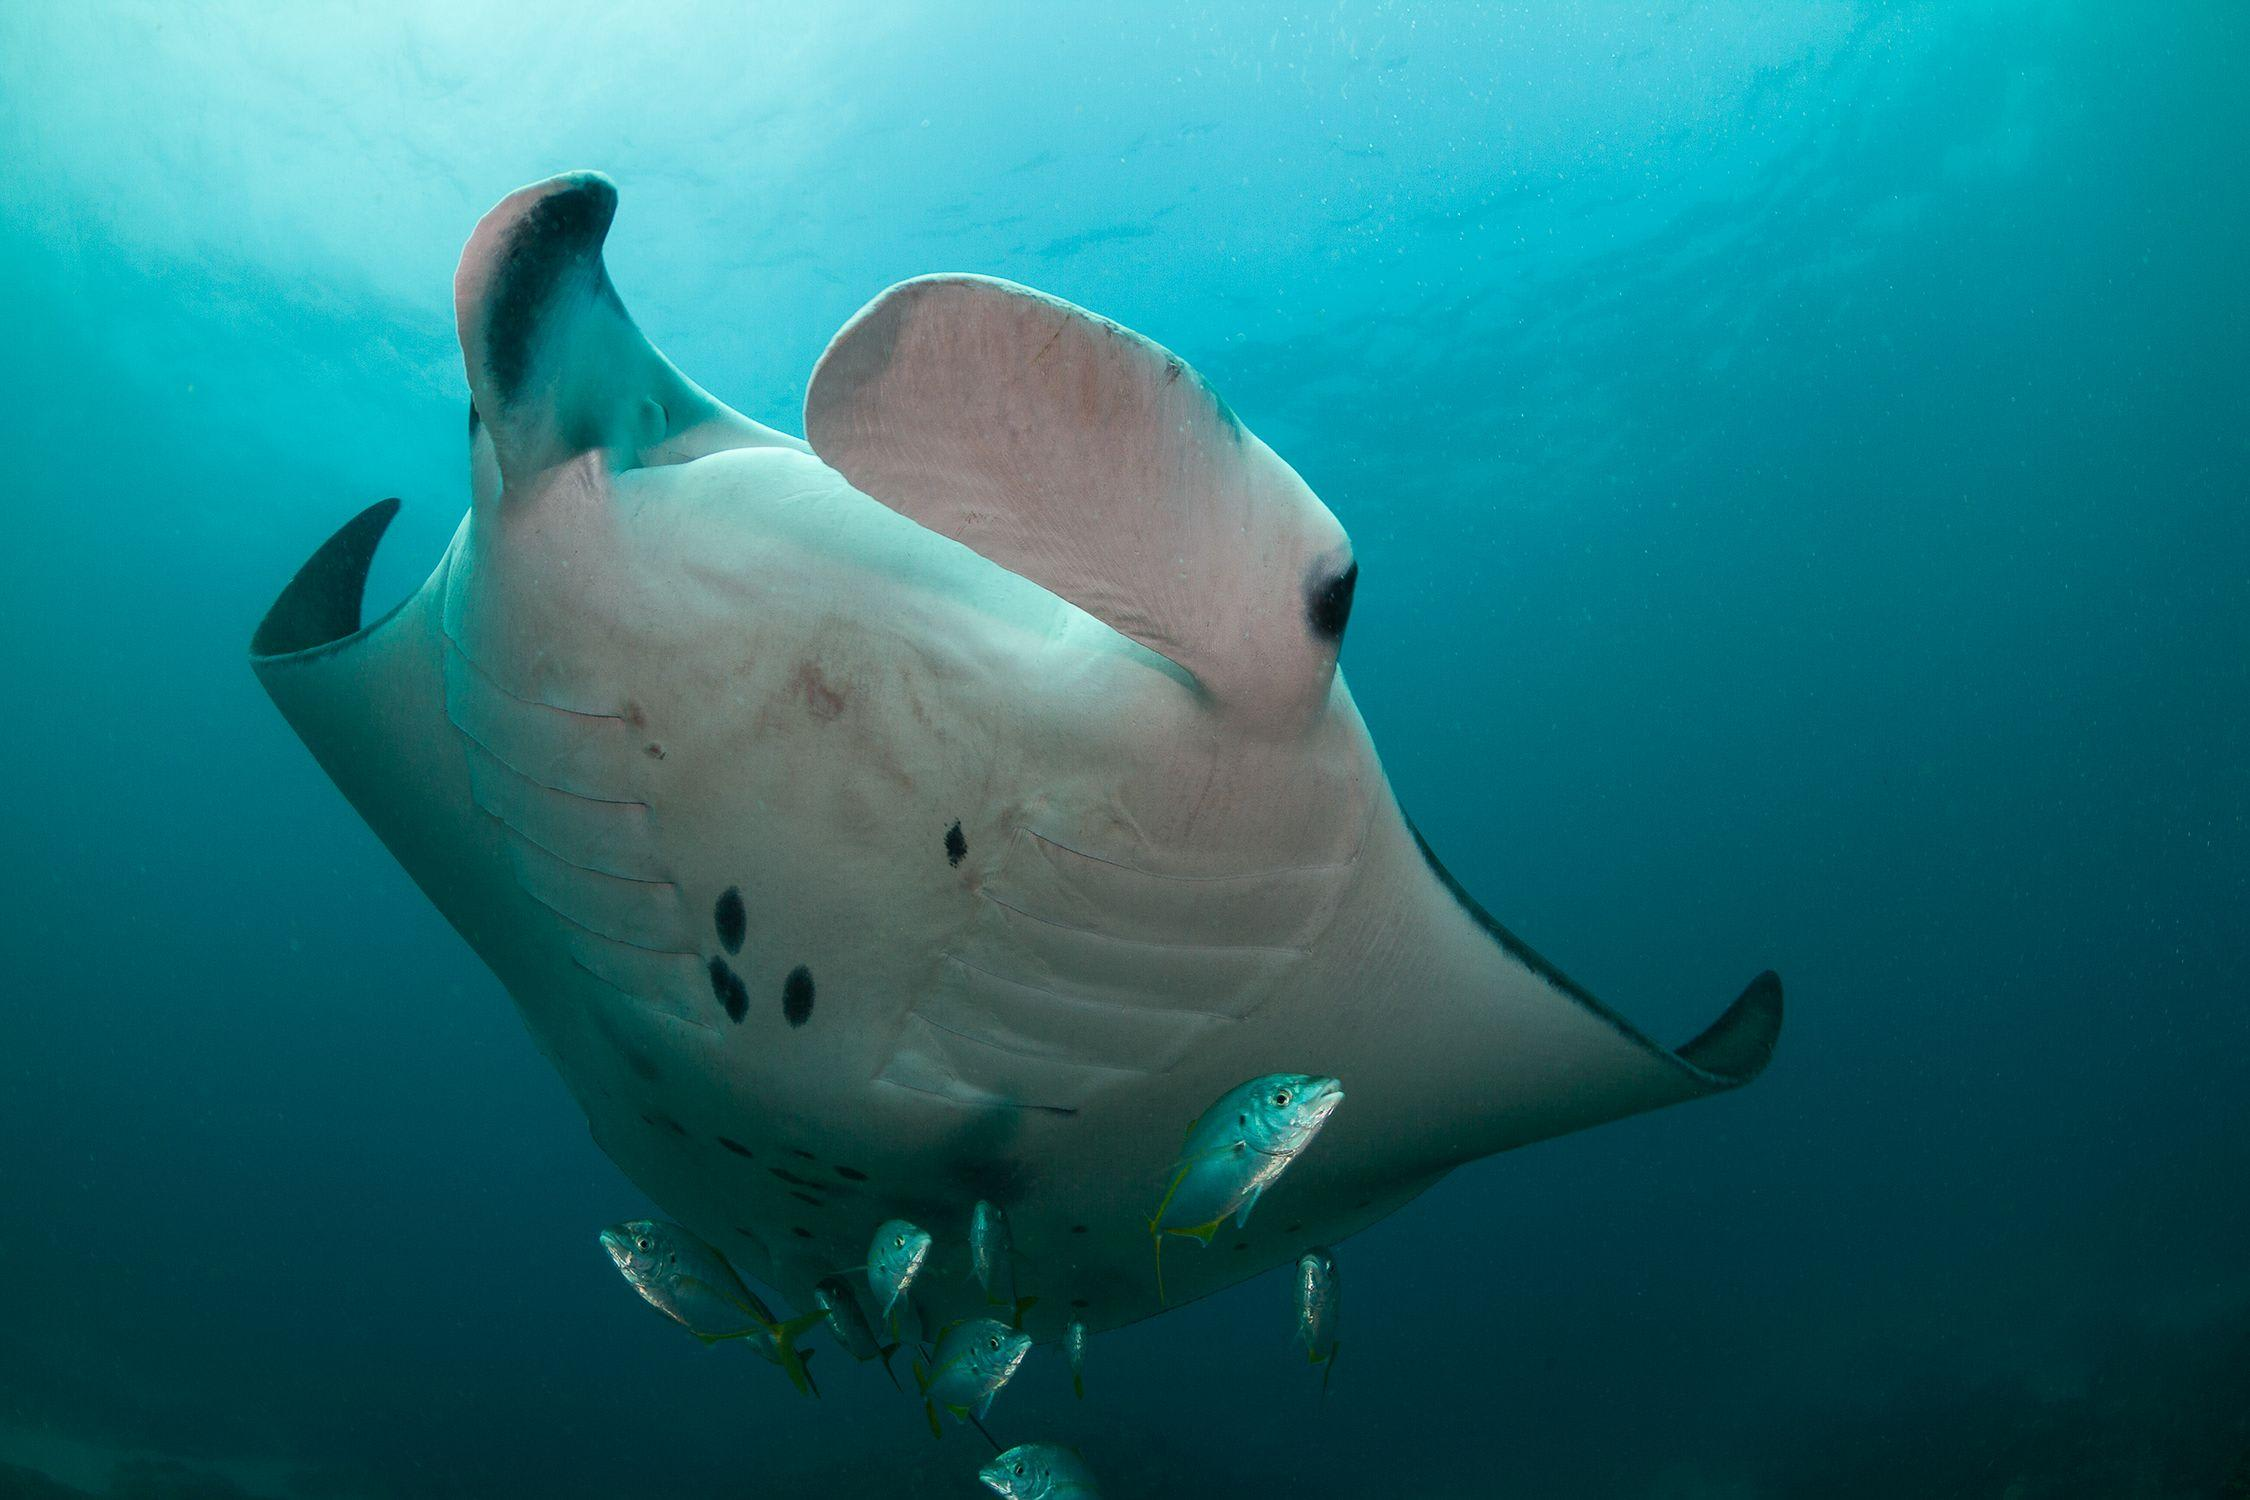 Scuba Dive at Julian Rocks, Byron Bay - Certified Divers Only